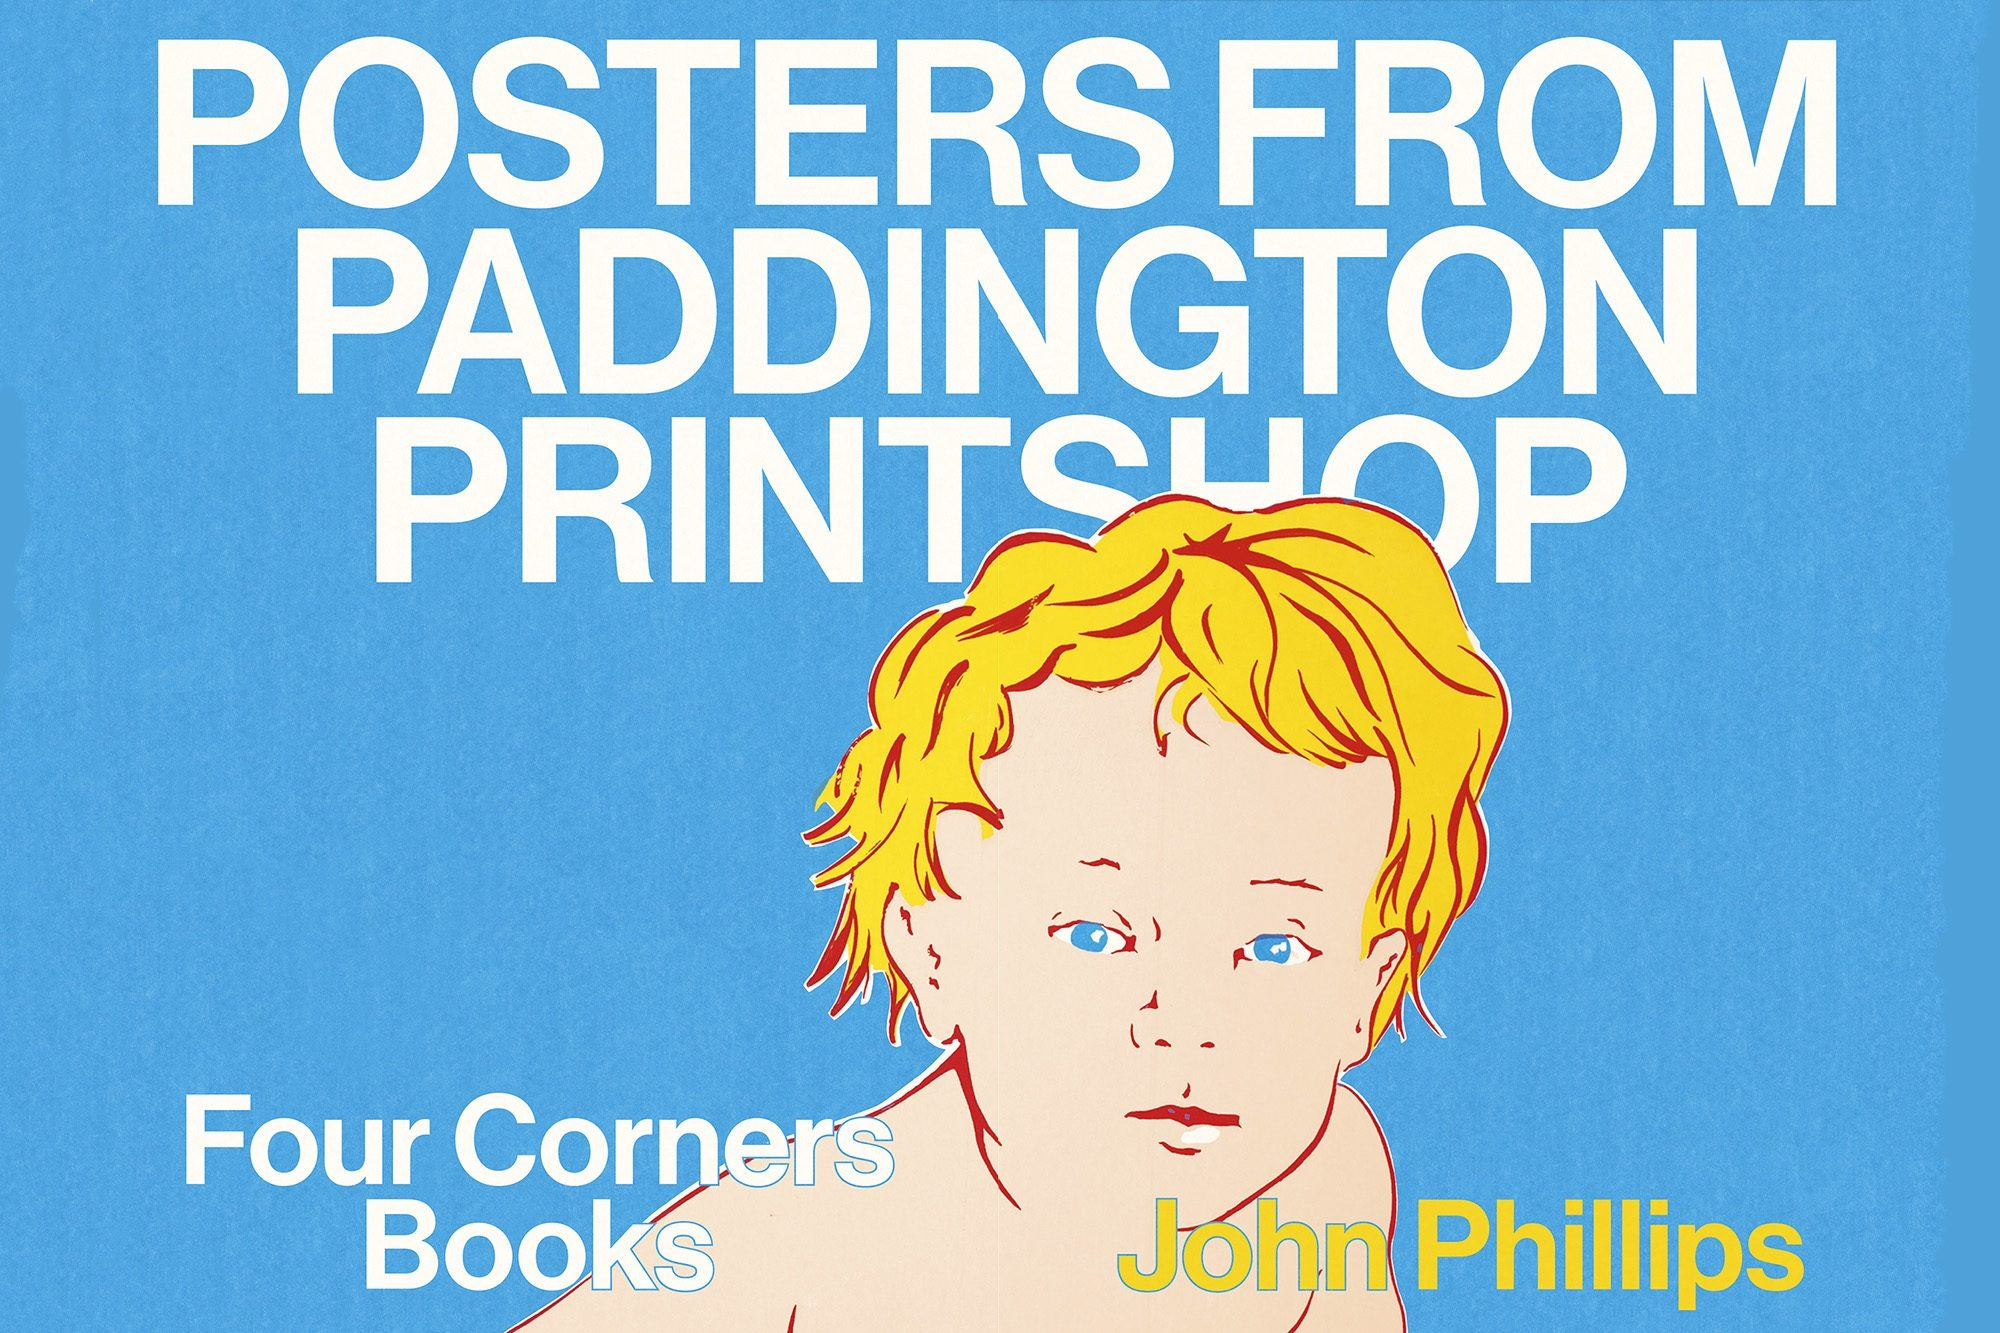 Paddington Printshop 2By3Banner